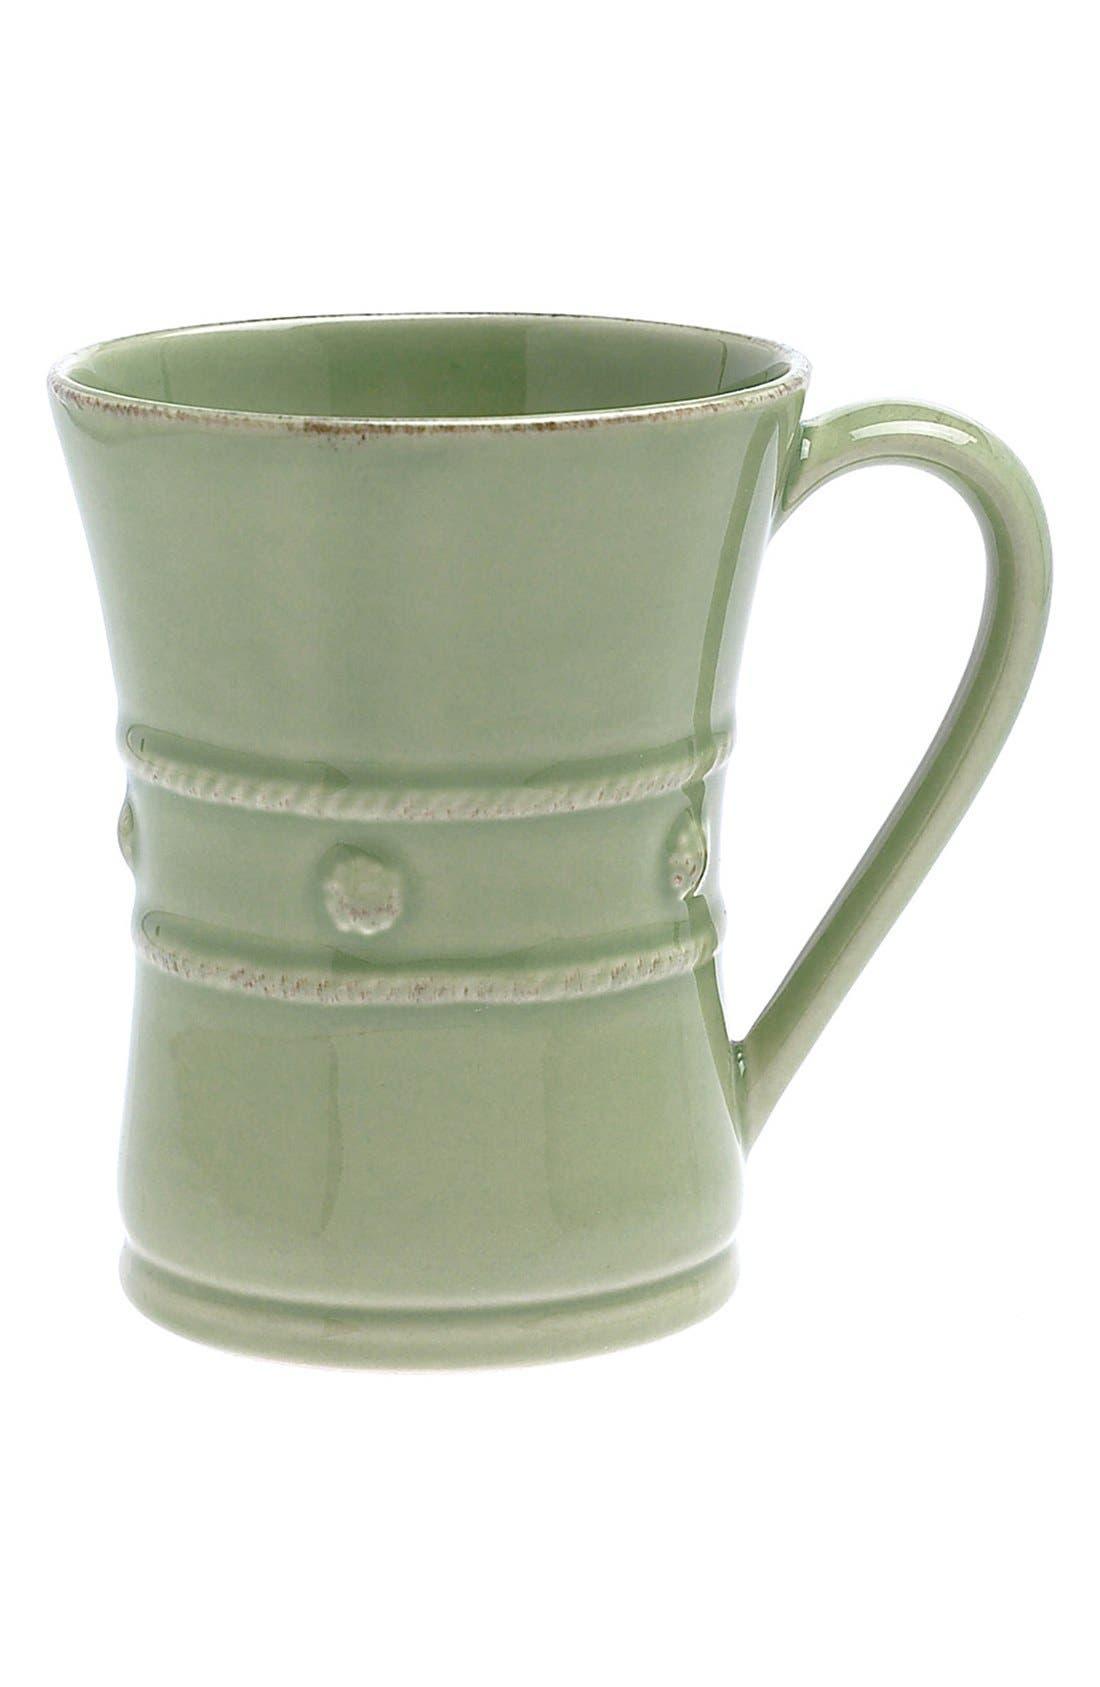 Alternate Image 1 Selected - Juliska 'Berry and Thread' Ceramic Coffee Mug